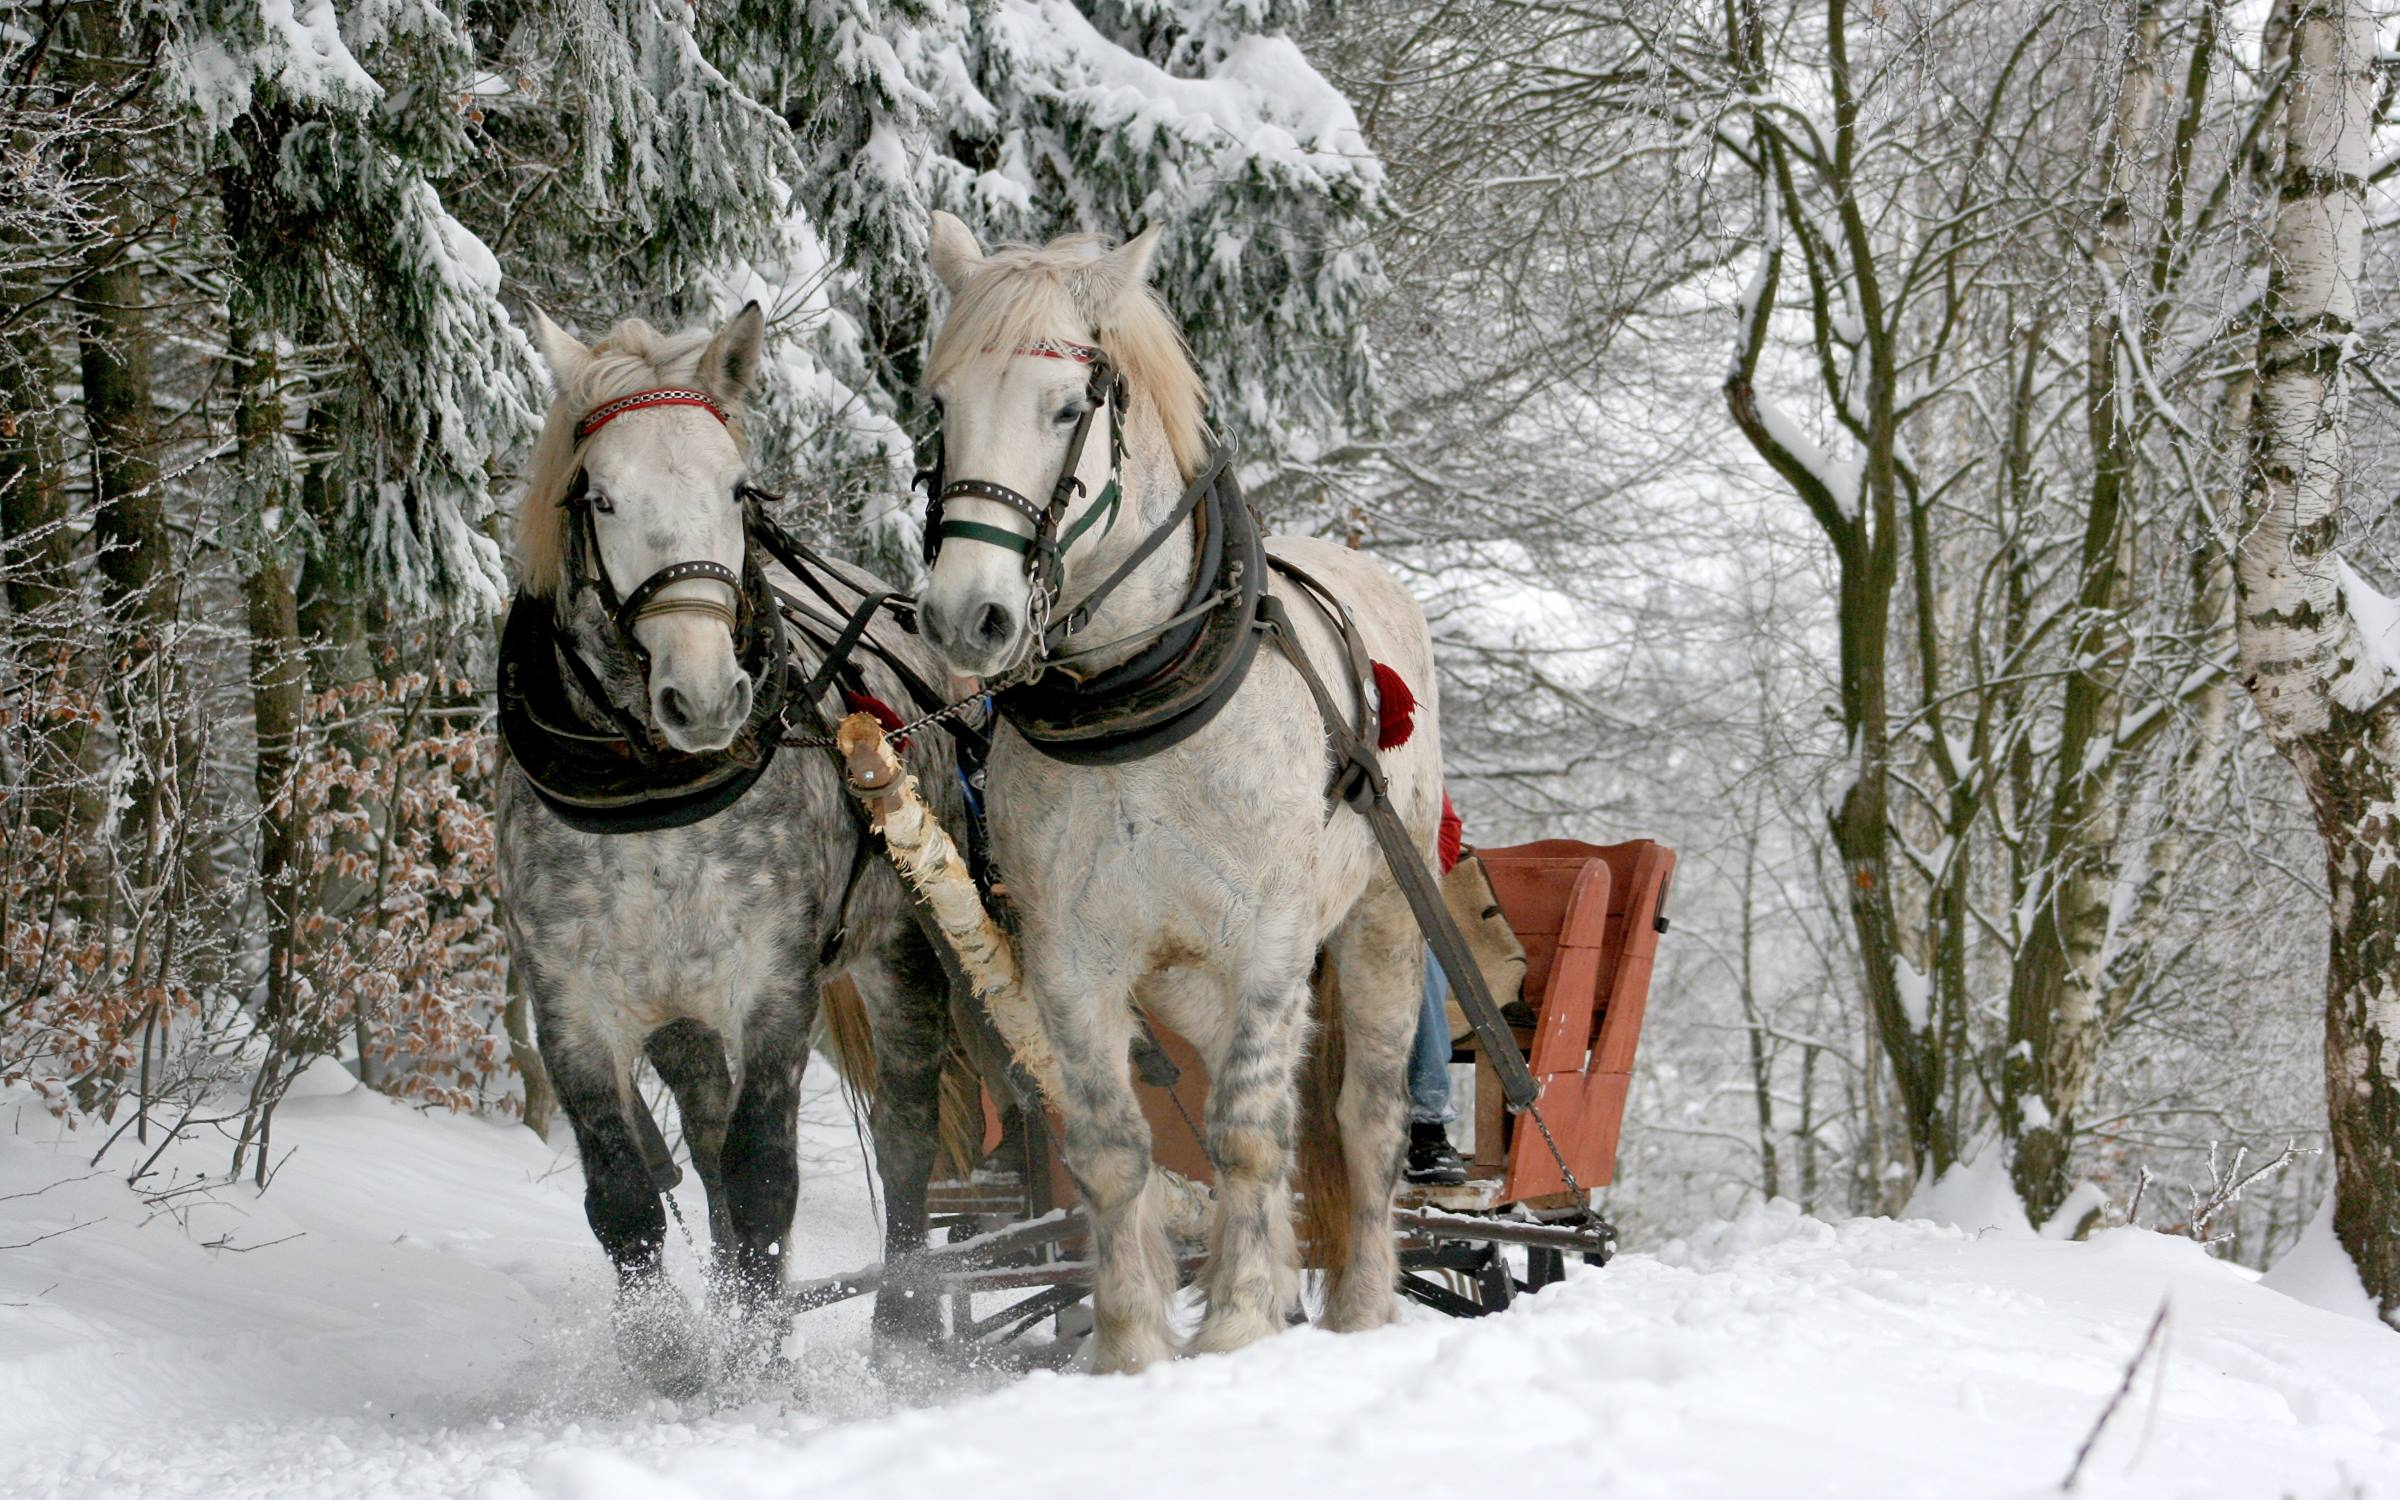 winter sleigh horses snow tress animals